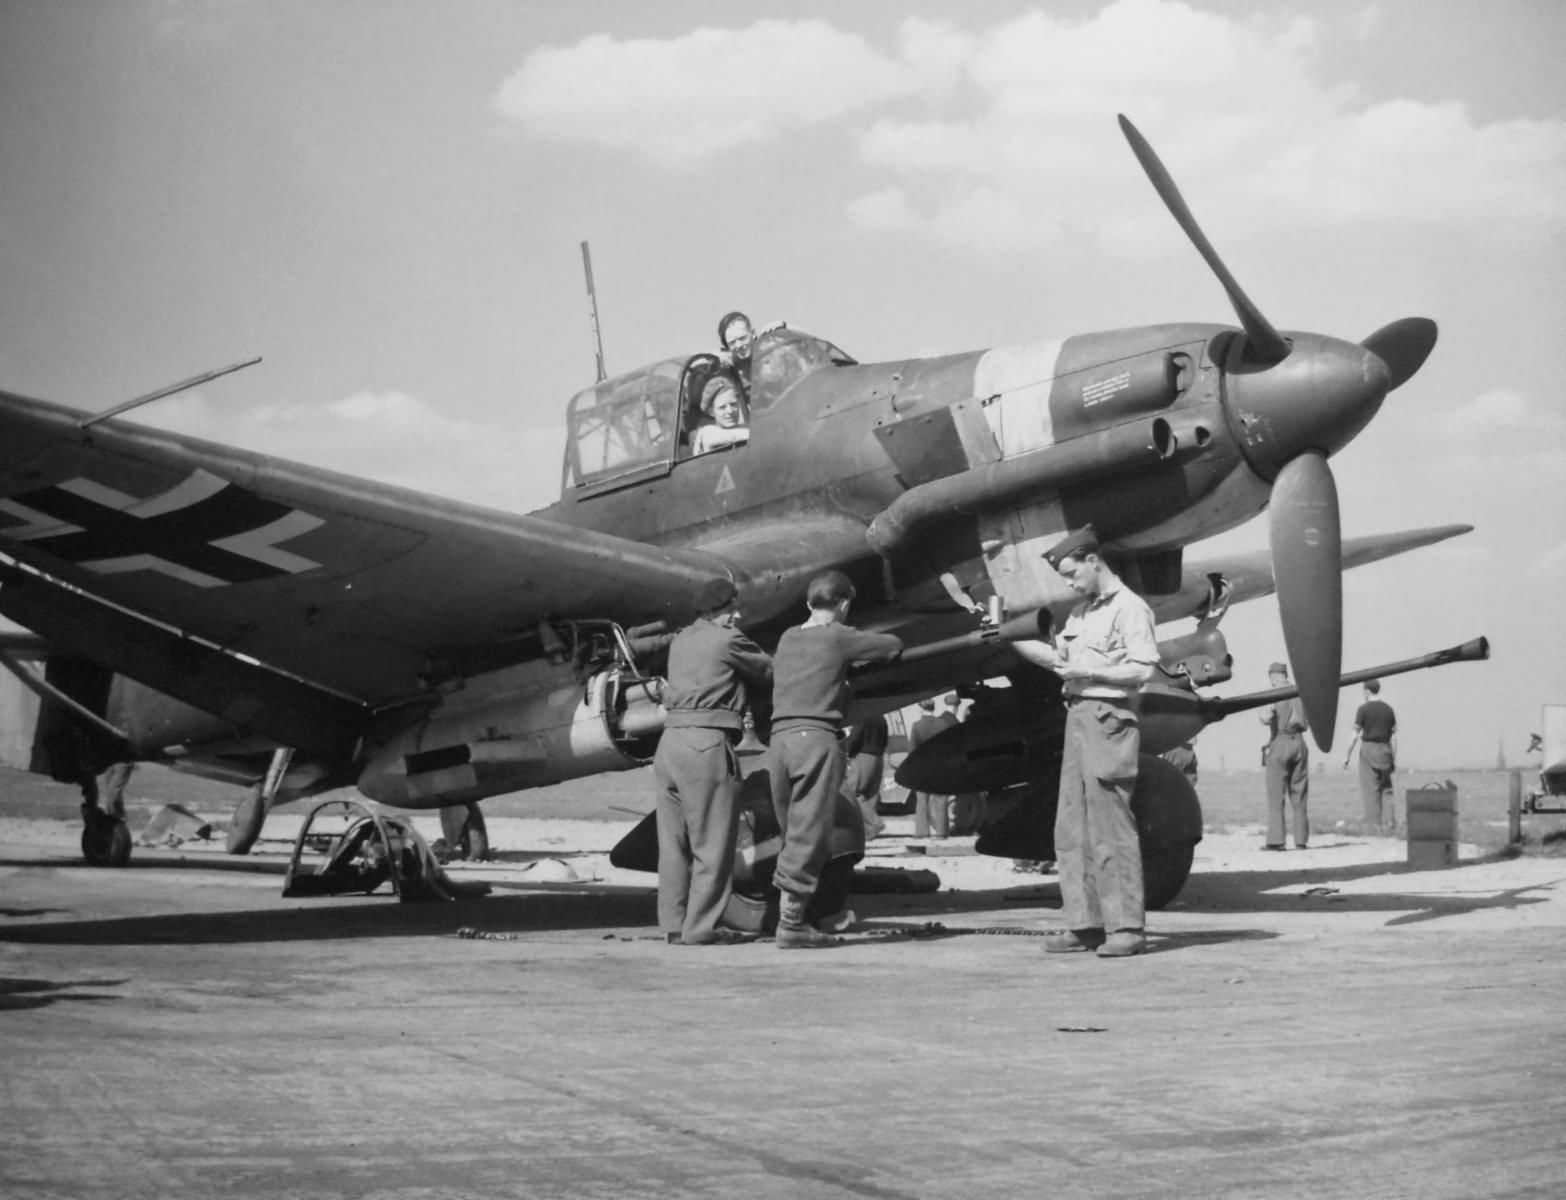 Junkers Ju 87 G-2 Kanonenvogel tank buster 1945